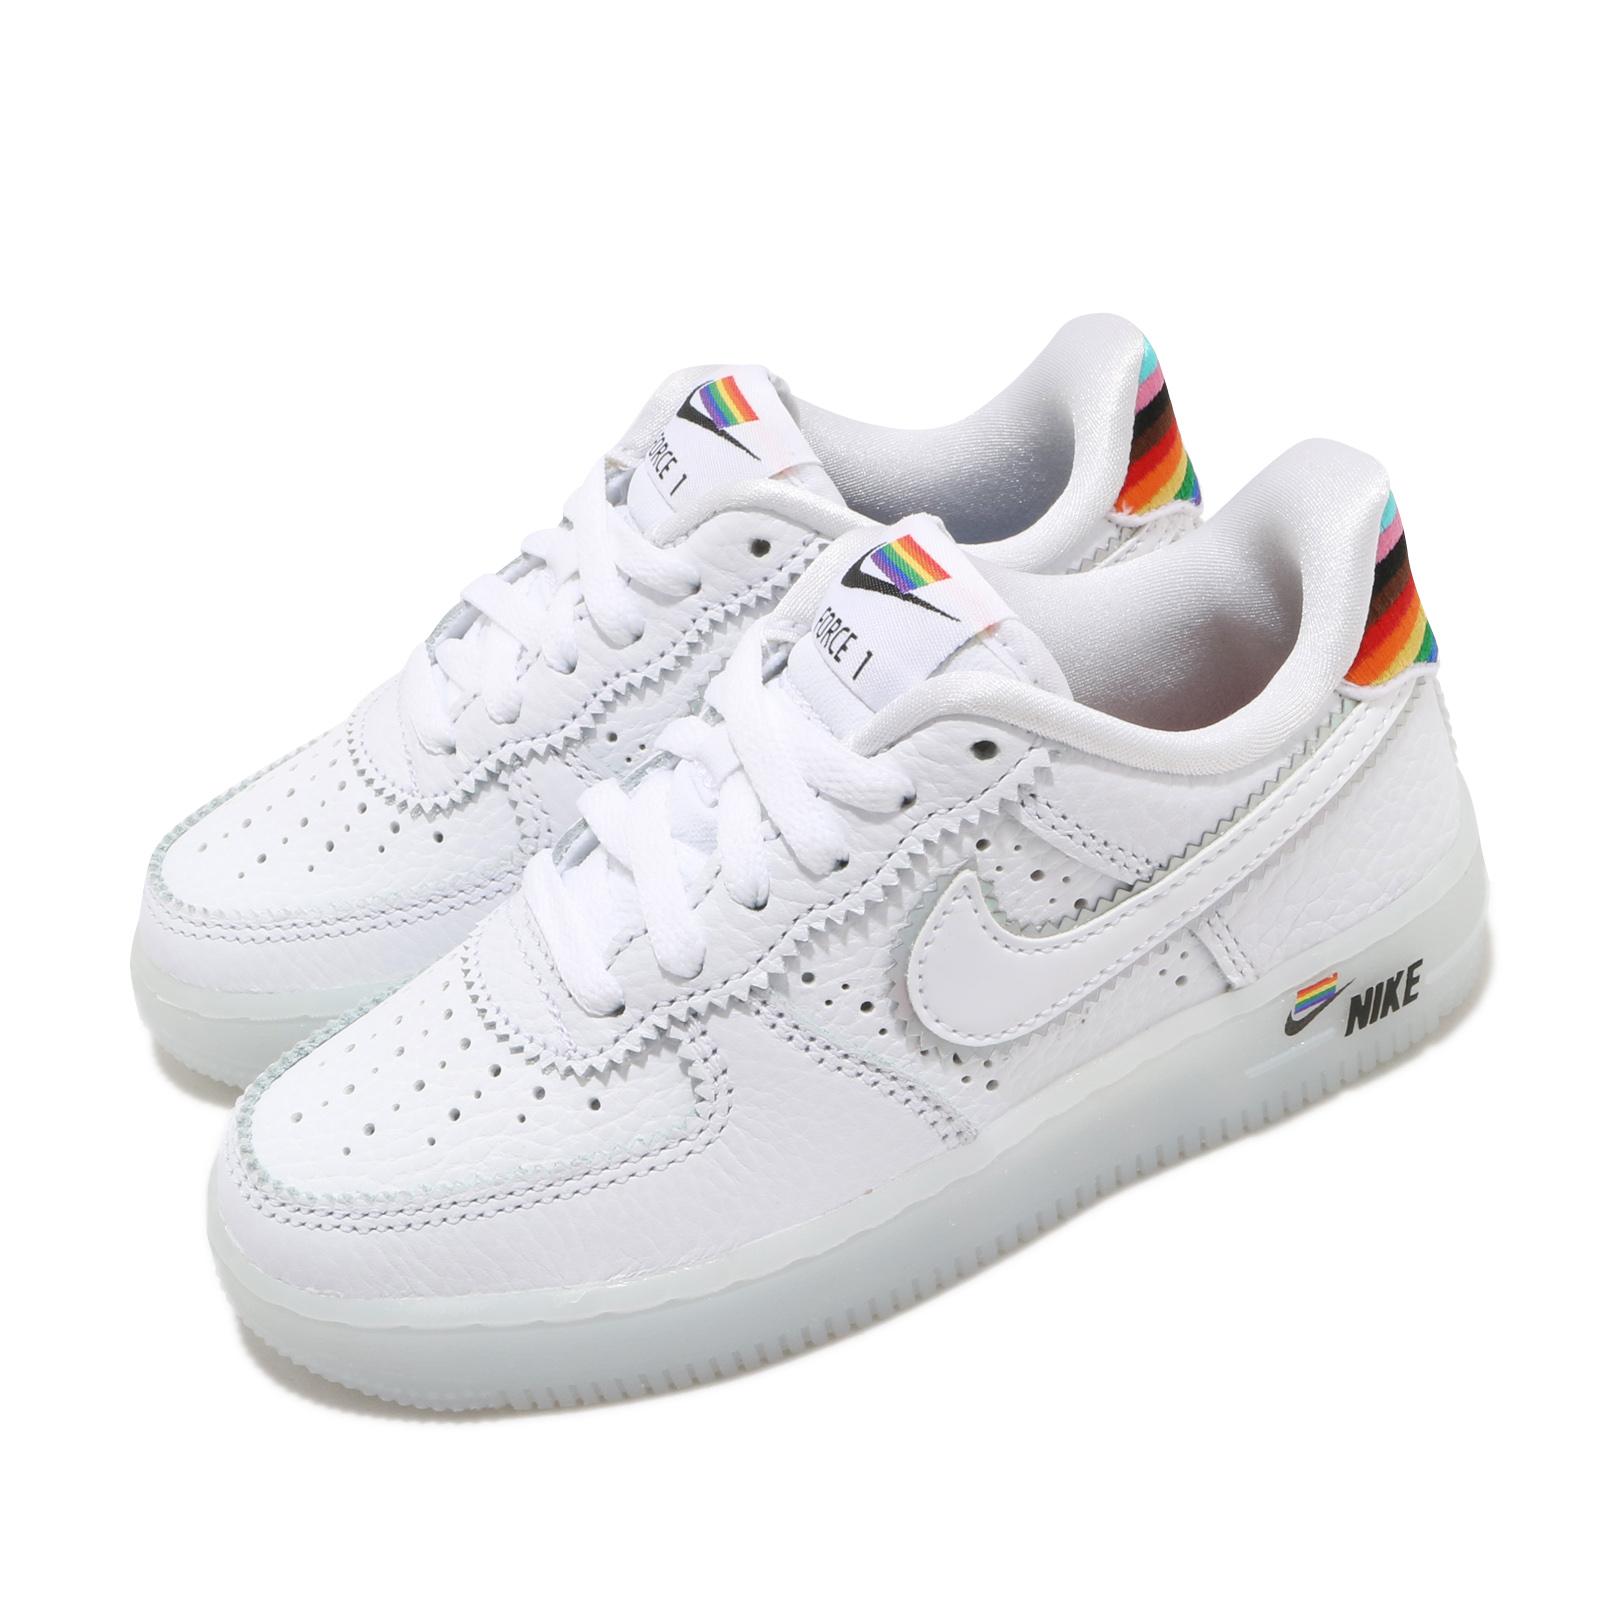 Nike 休閒鞋 Air Force 1 BT PS 運動 童鞋 興別平權 皮革 質感 AF1 中童 穿搭 白 彩 CW7439100 CW7439-100